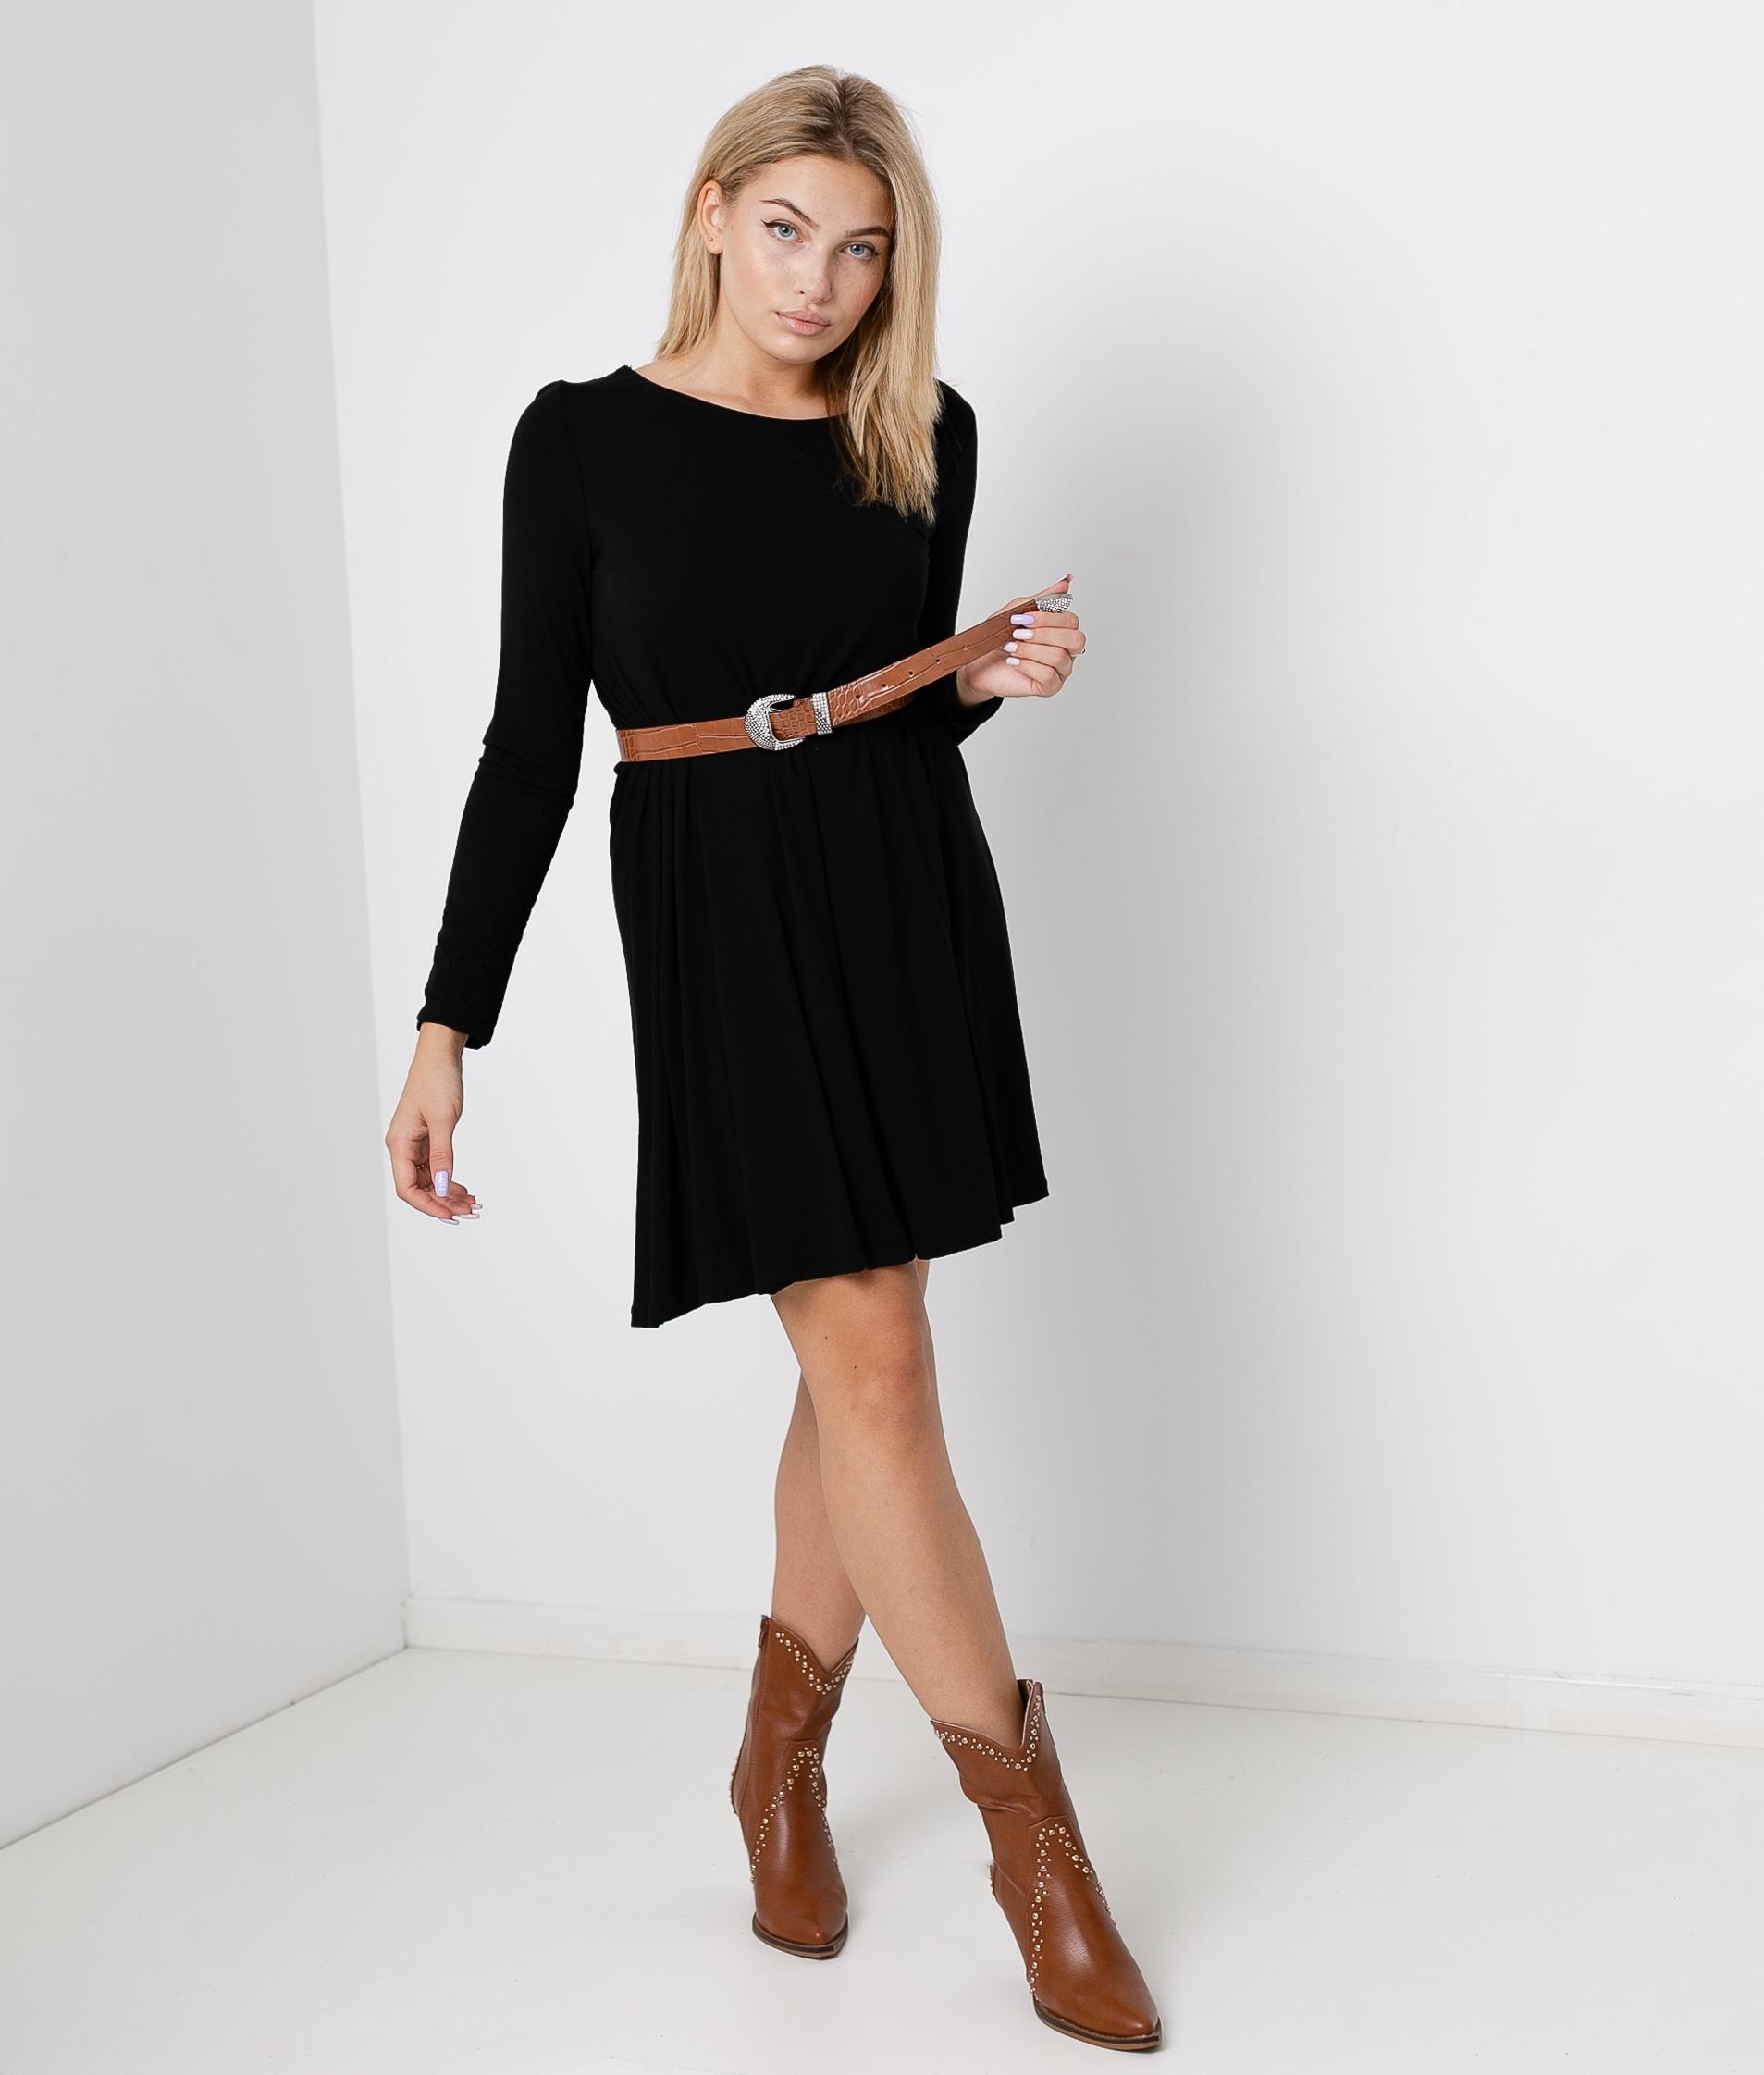 RIOLO DRESS - BLACK